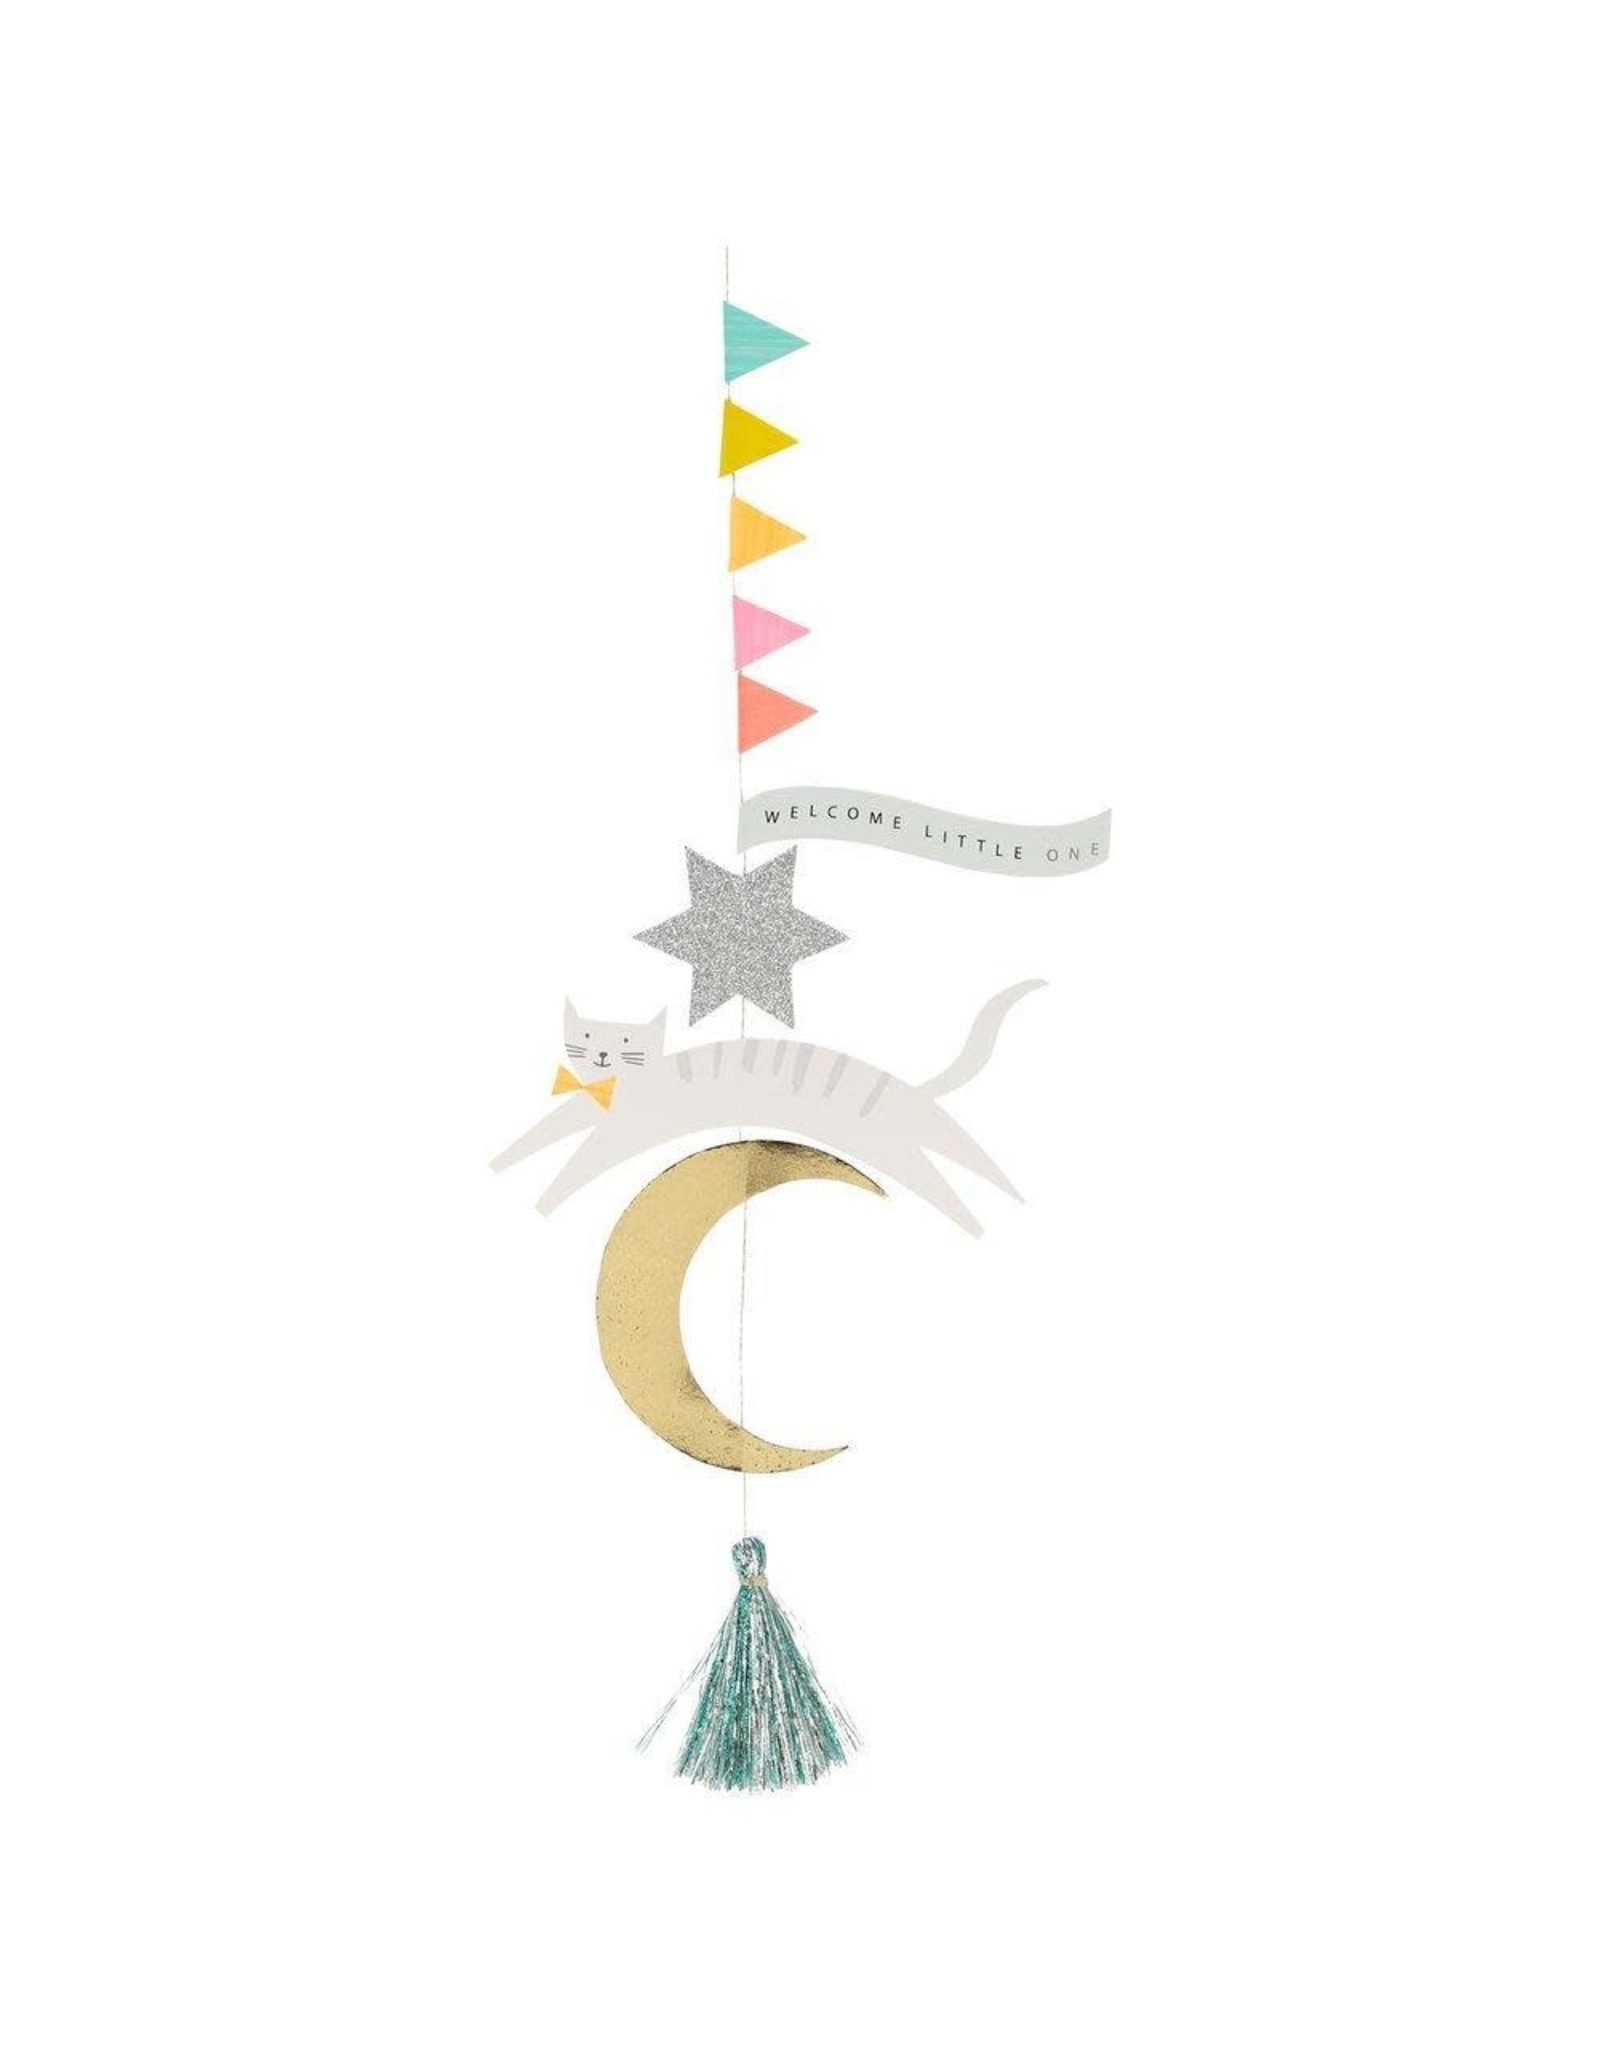 Meri Meri Wenskaart - Welcome little one - Hanging Decoration + Envelop - 13,5 x 18,5 - Congratulations